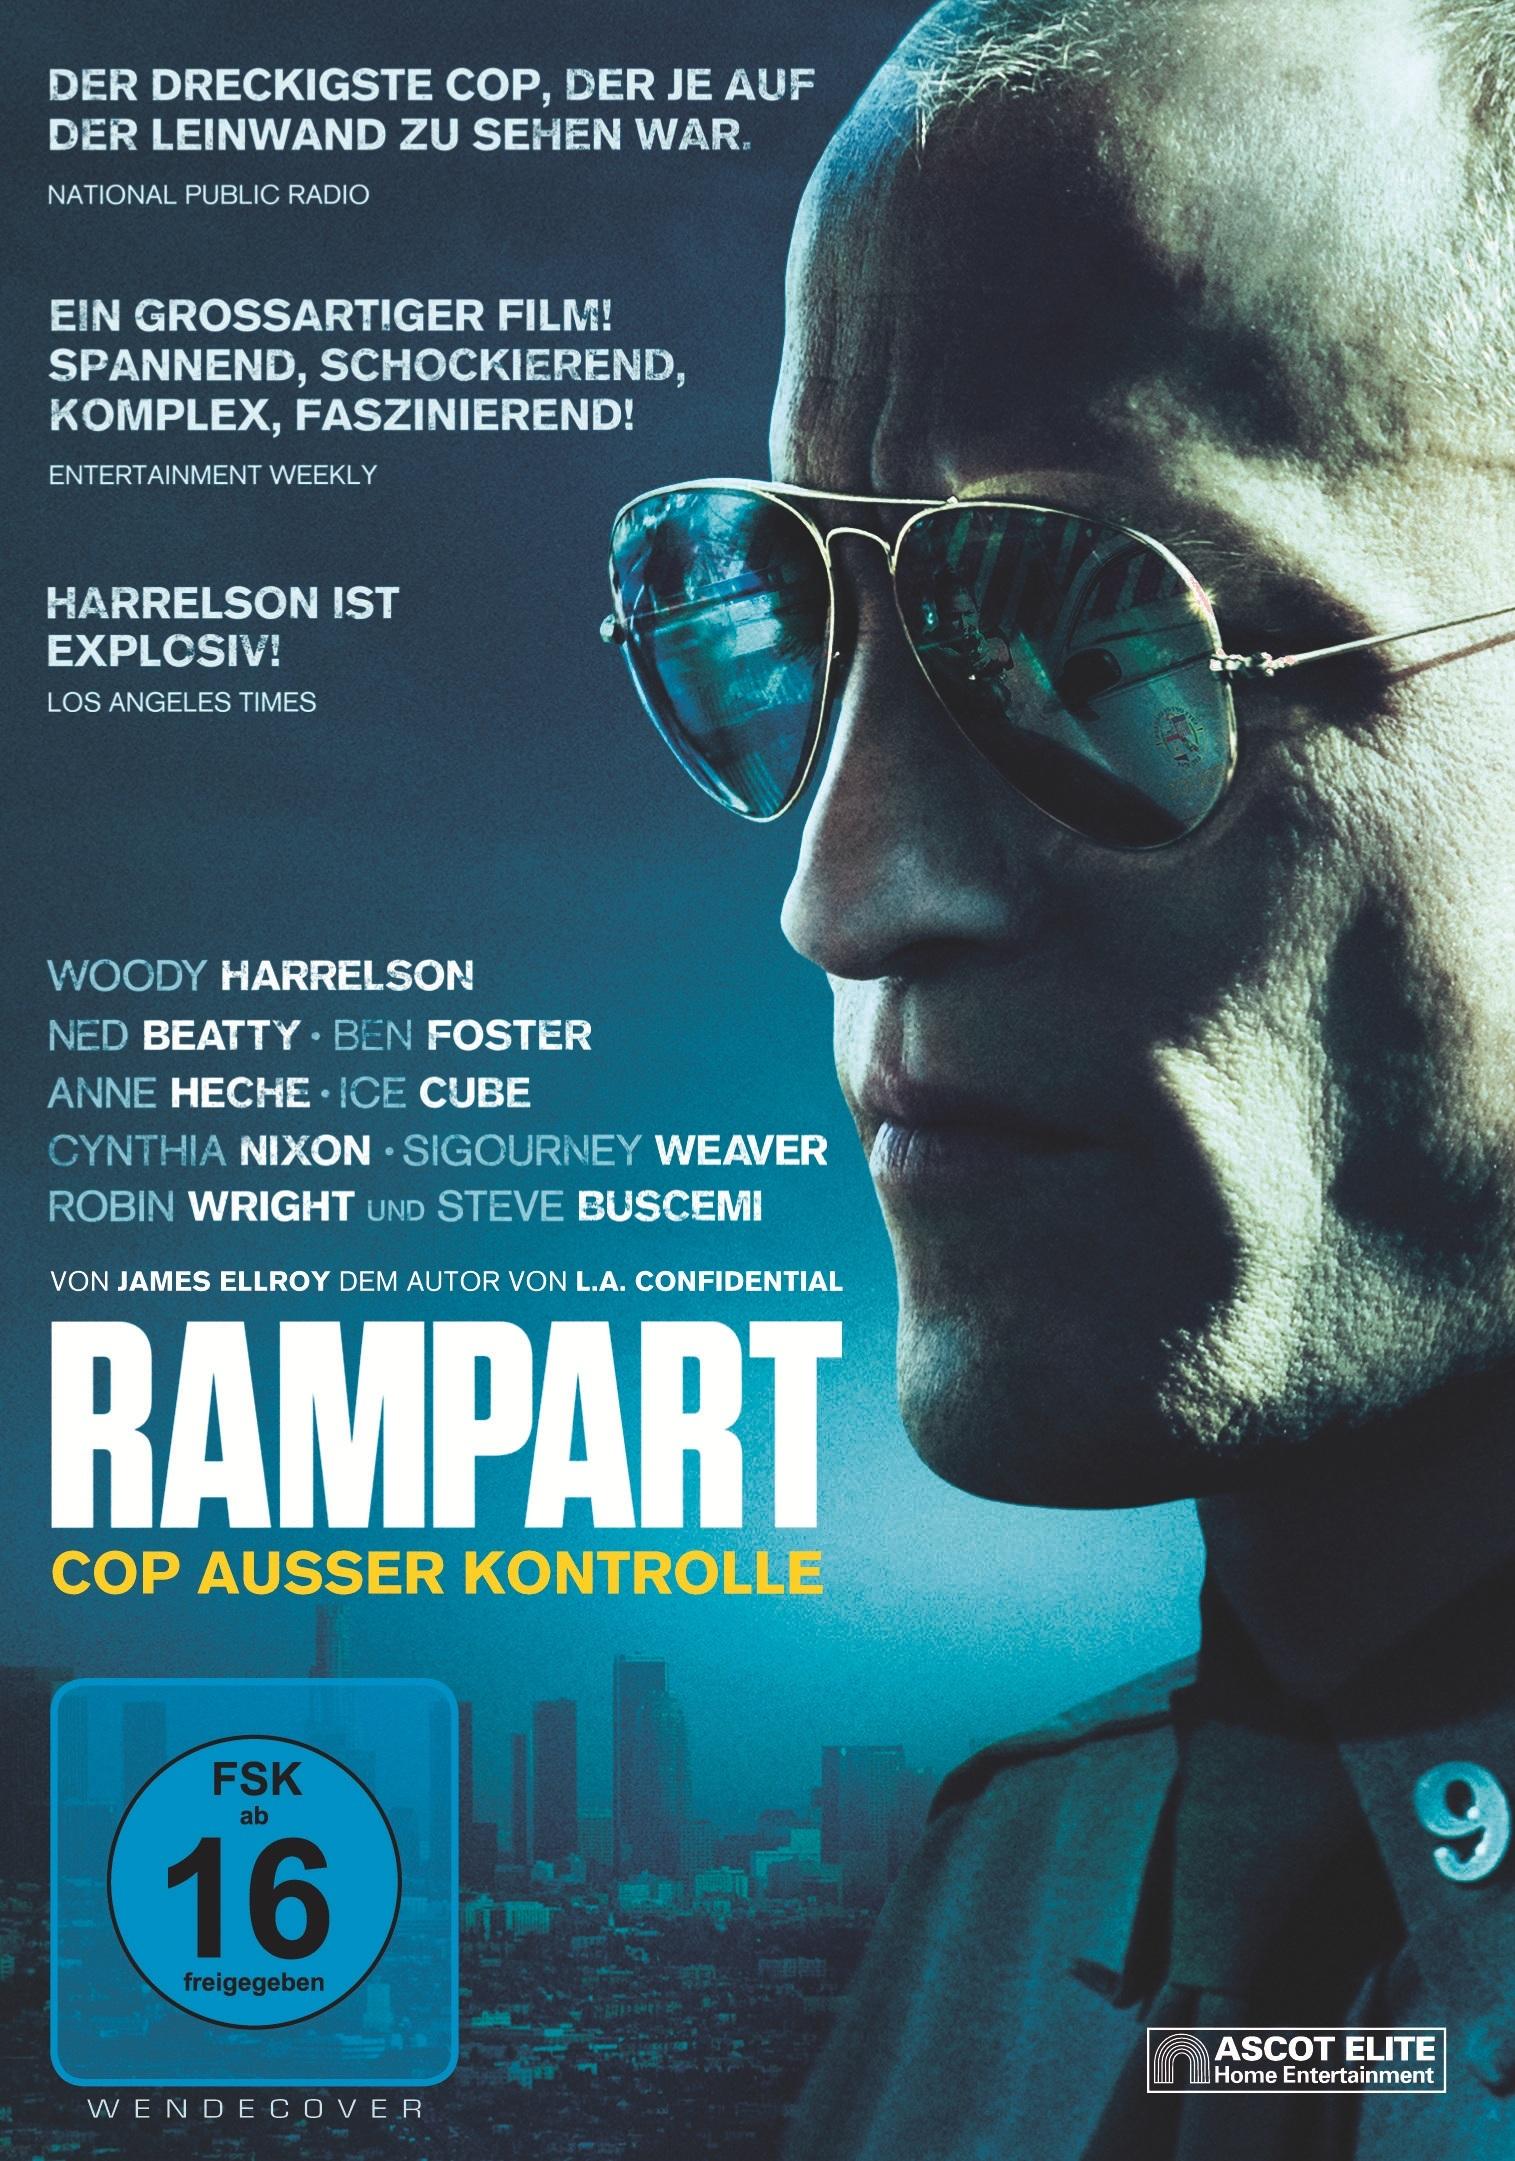 Image of Rampart - Cop ausser Kontrolle